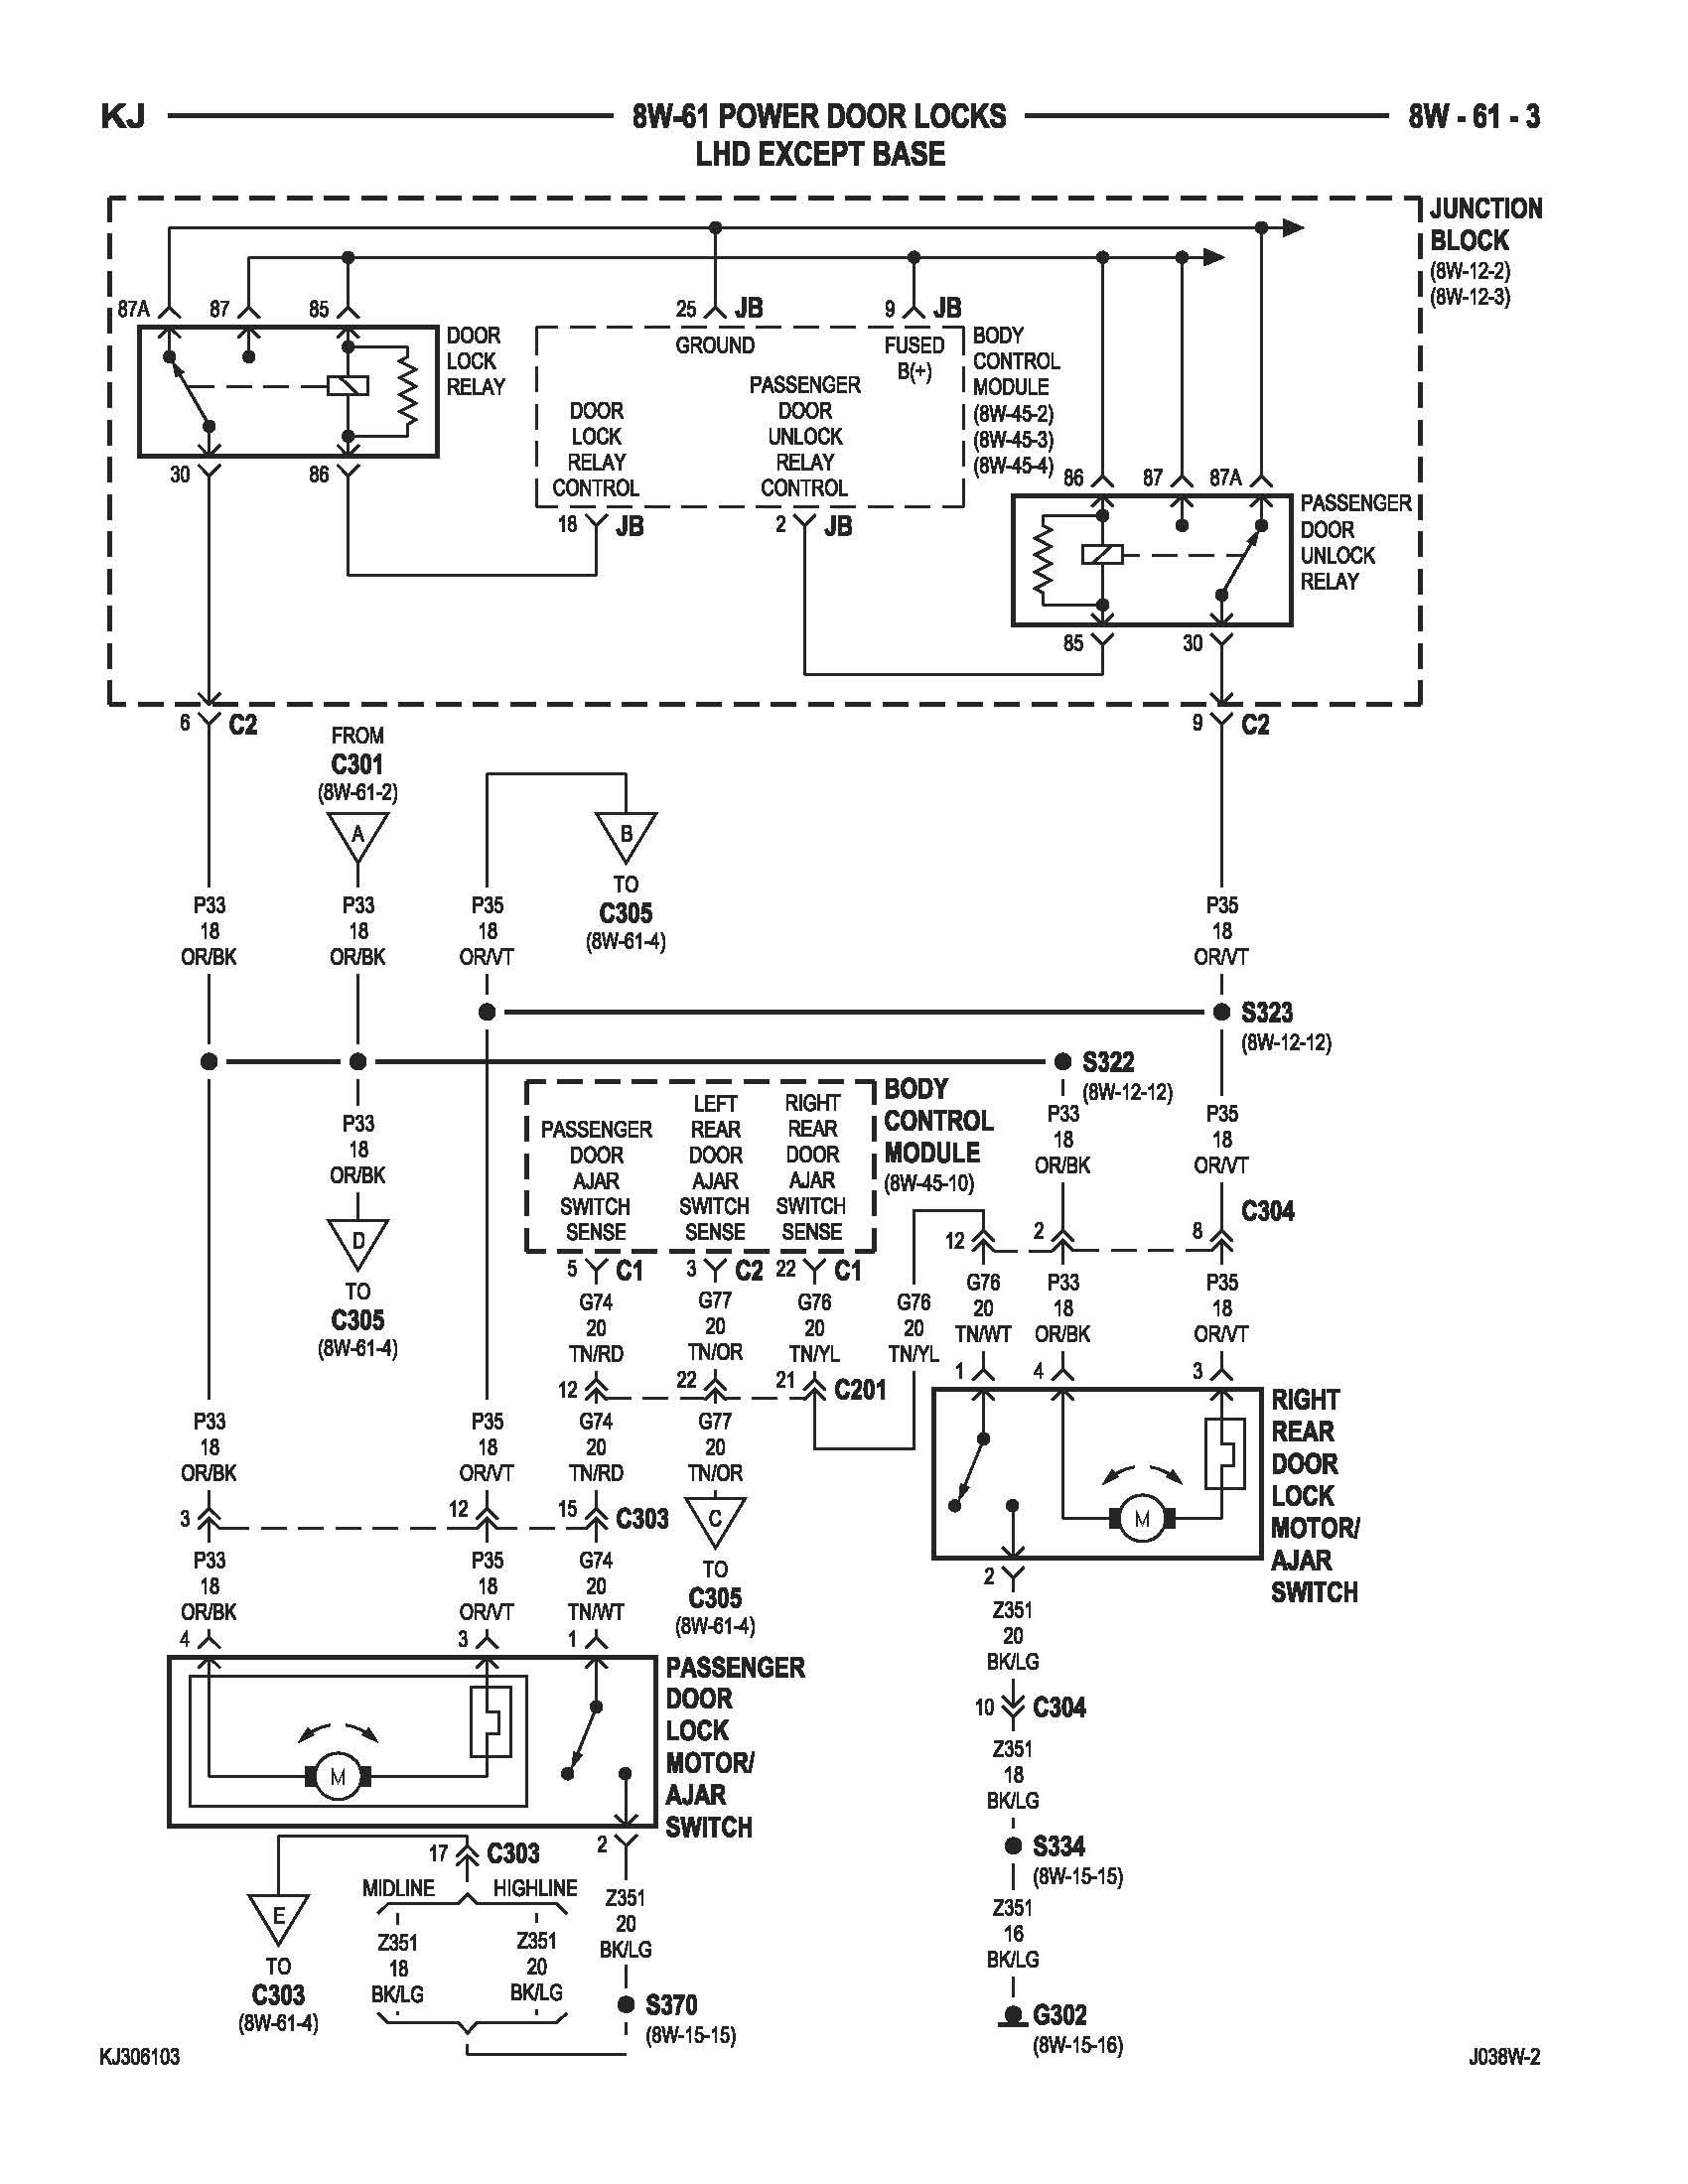 wiring diagram jeep liberty 2008 - harley davidson engine parts diagram -  hyundaiii.2005vtx.jeanjaures37.fr  wiring diagram resource